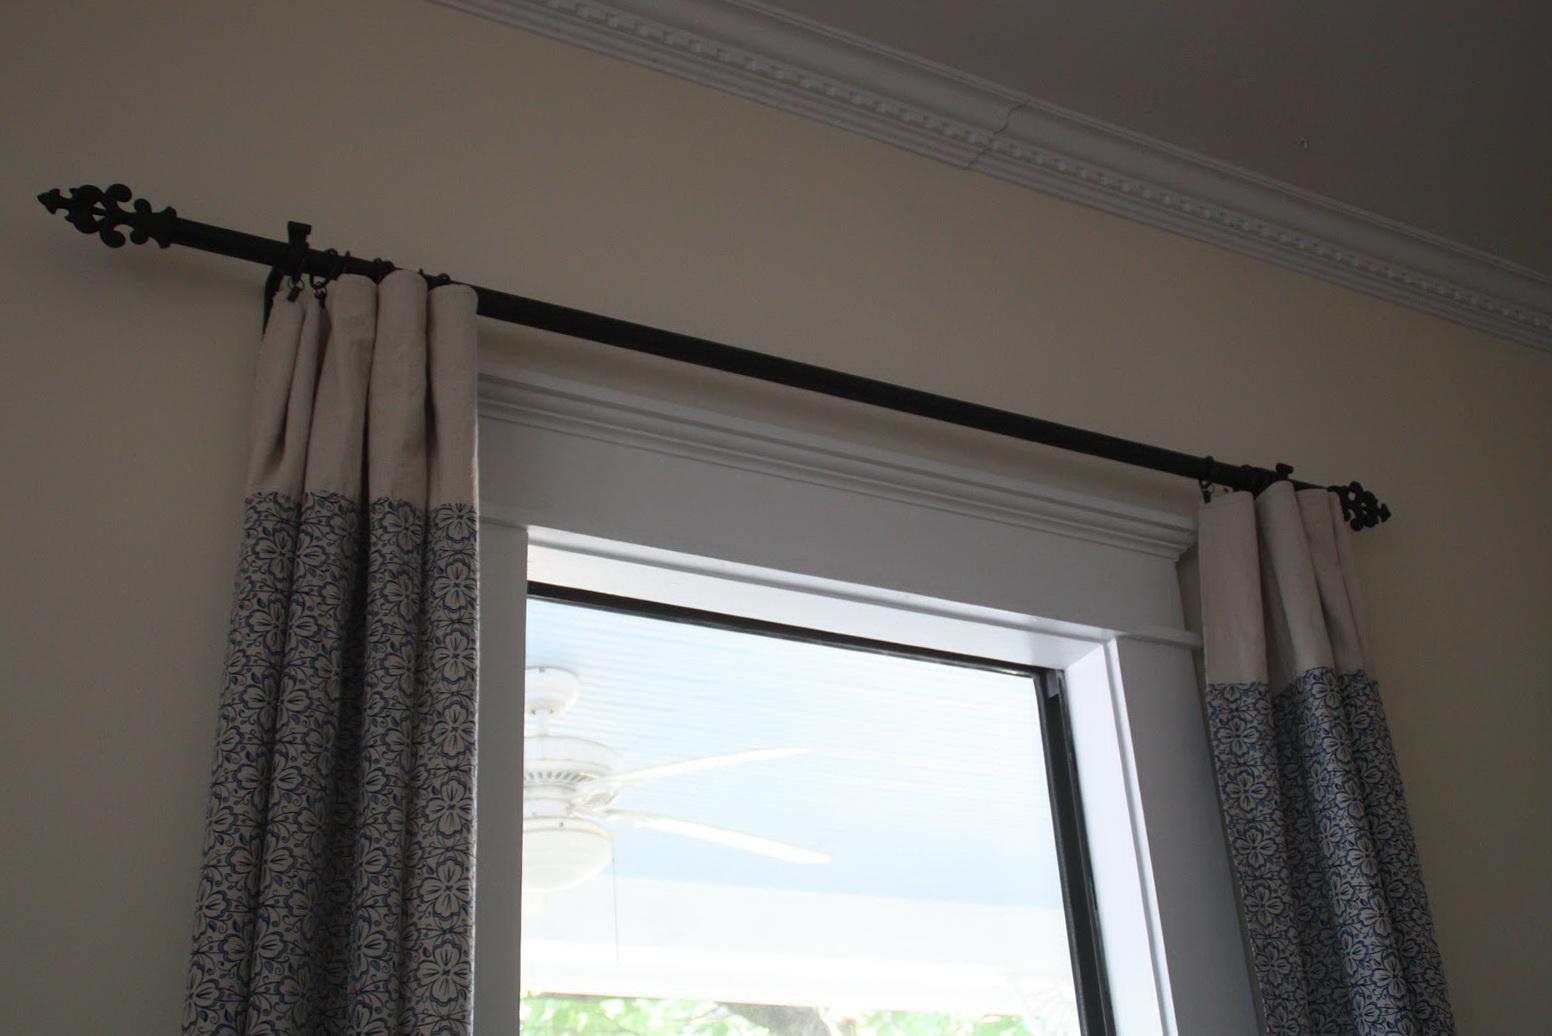 Restoration Hardware Curtain Rod